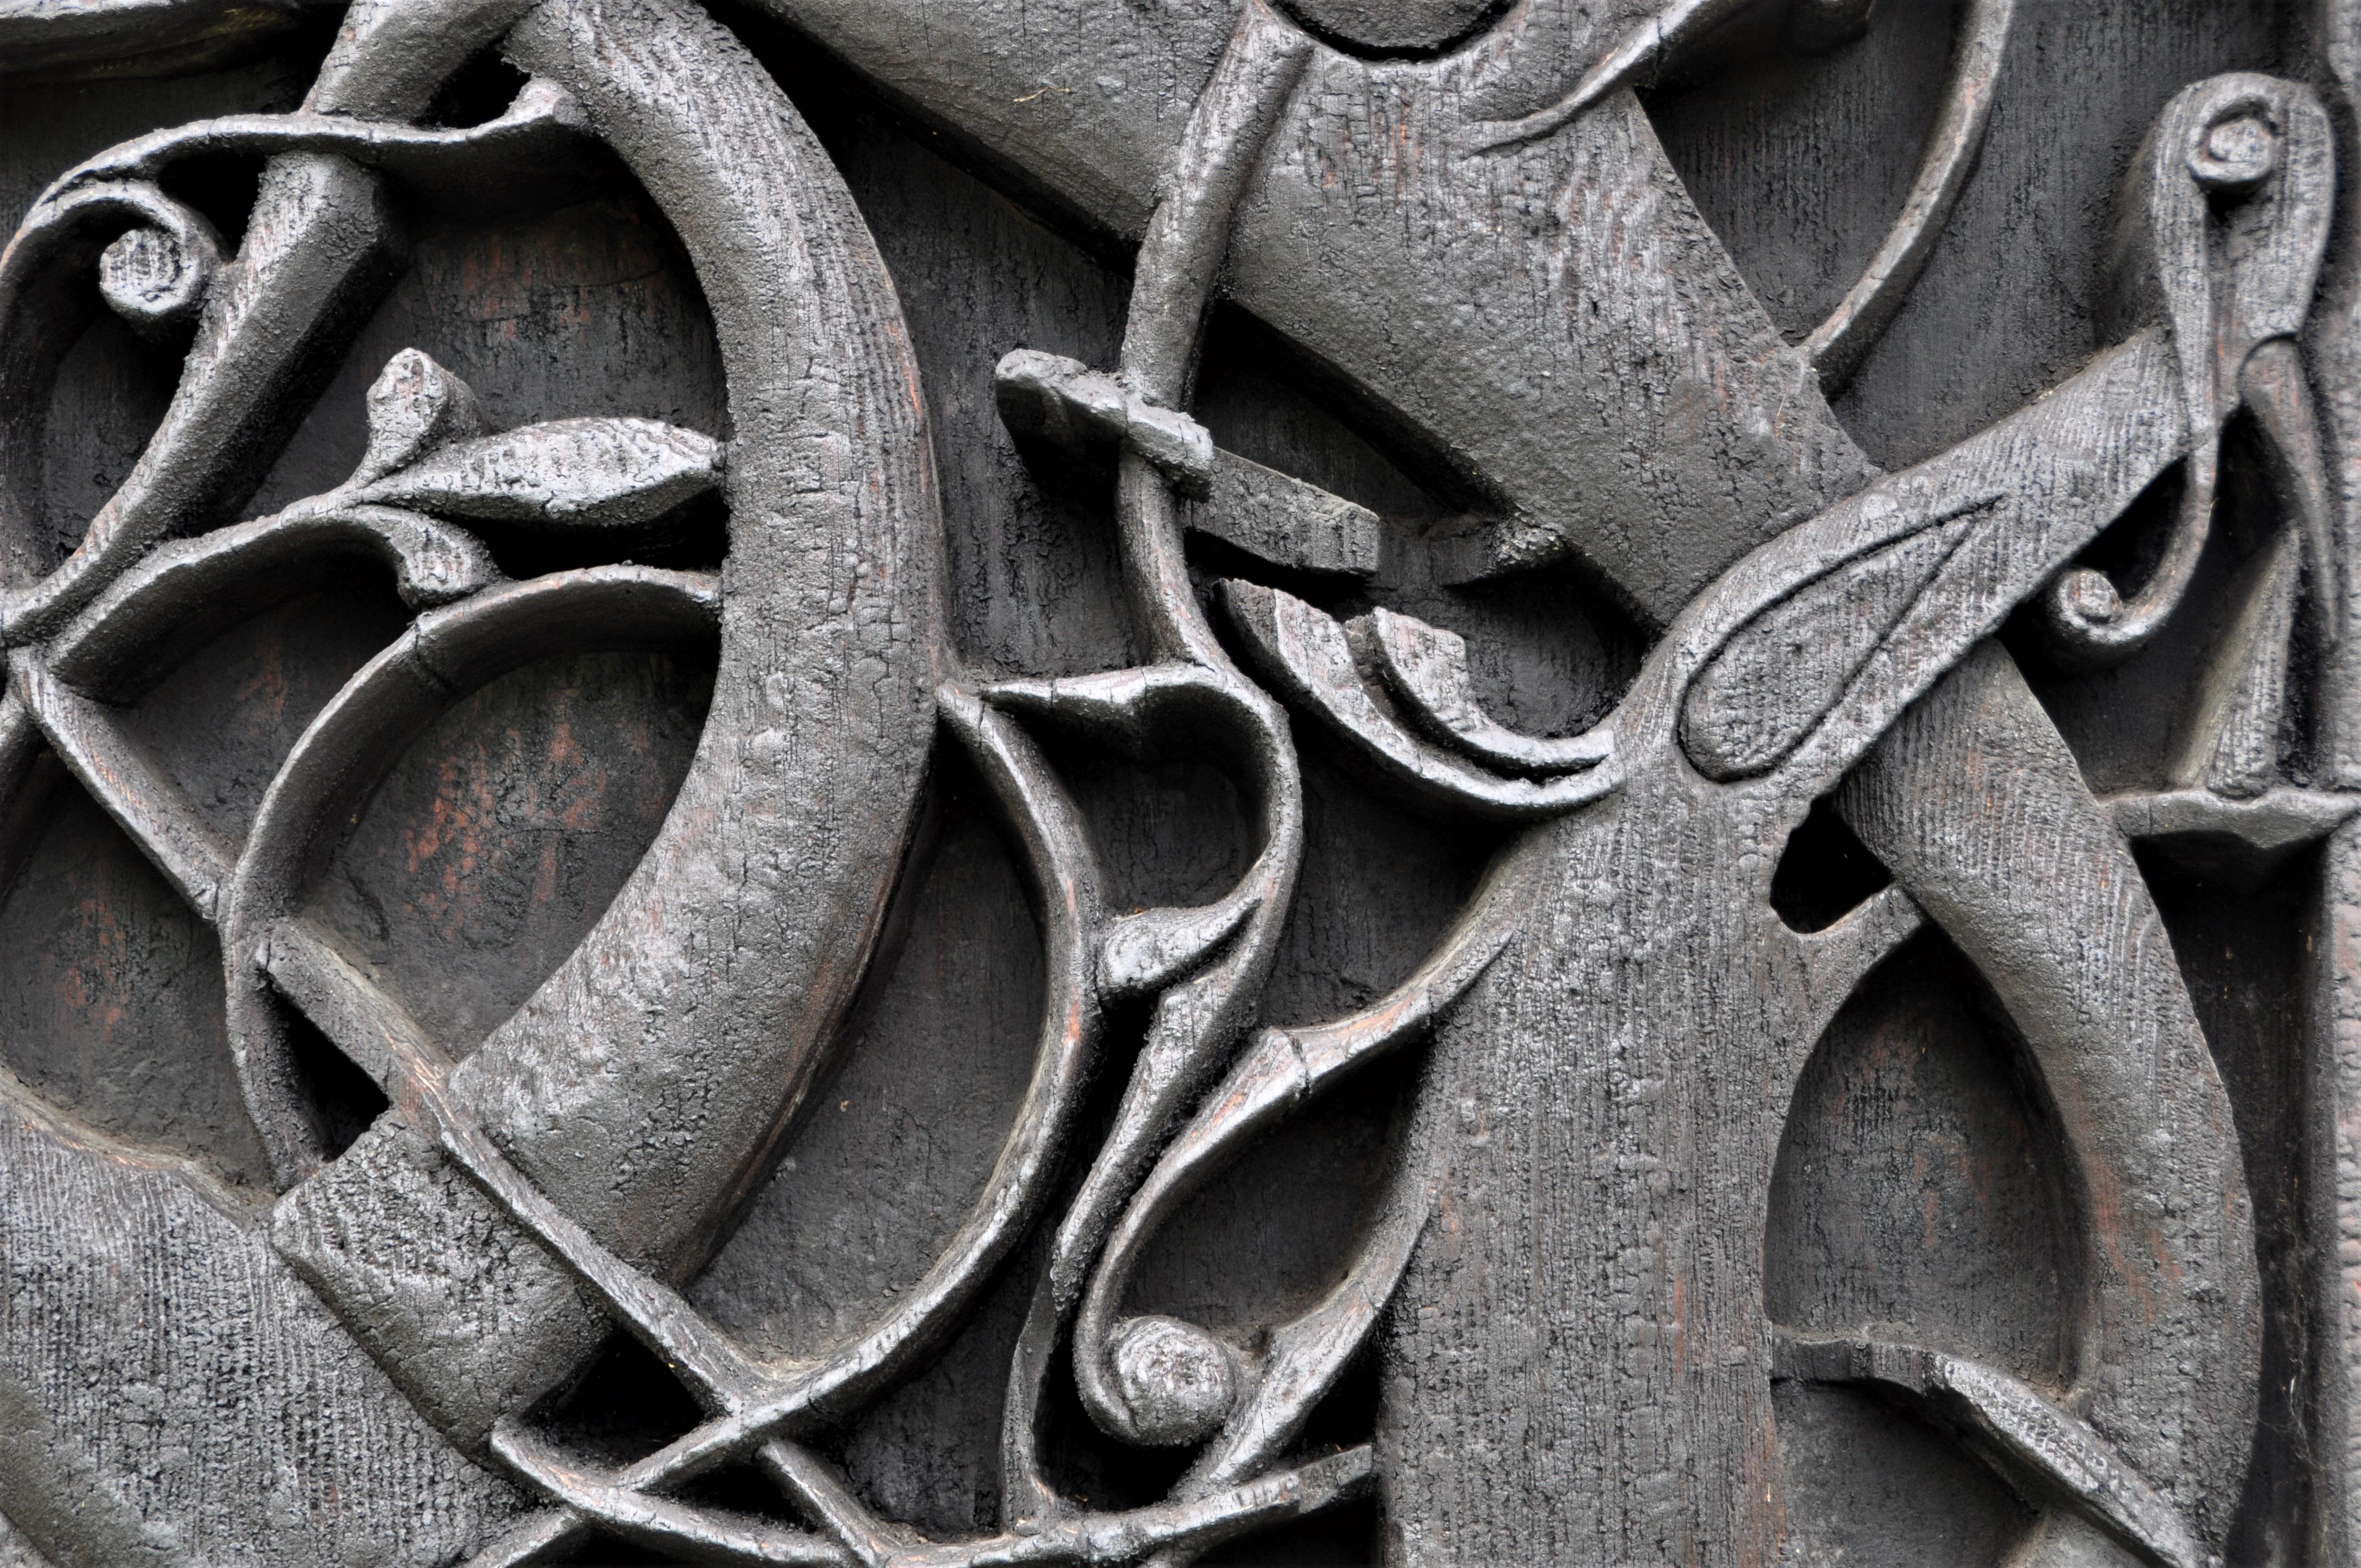 Free images animal floral spoke metal ornament iron